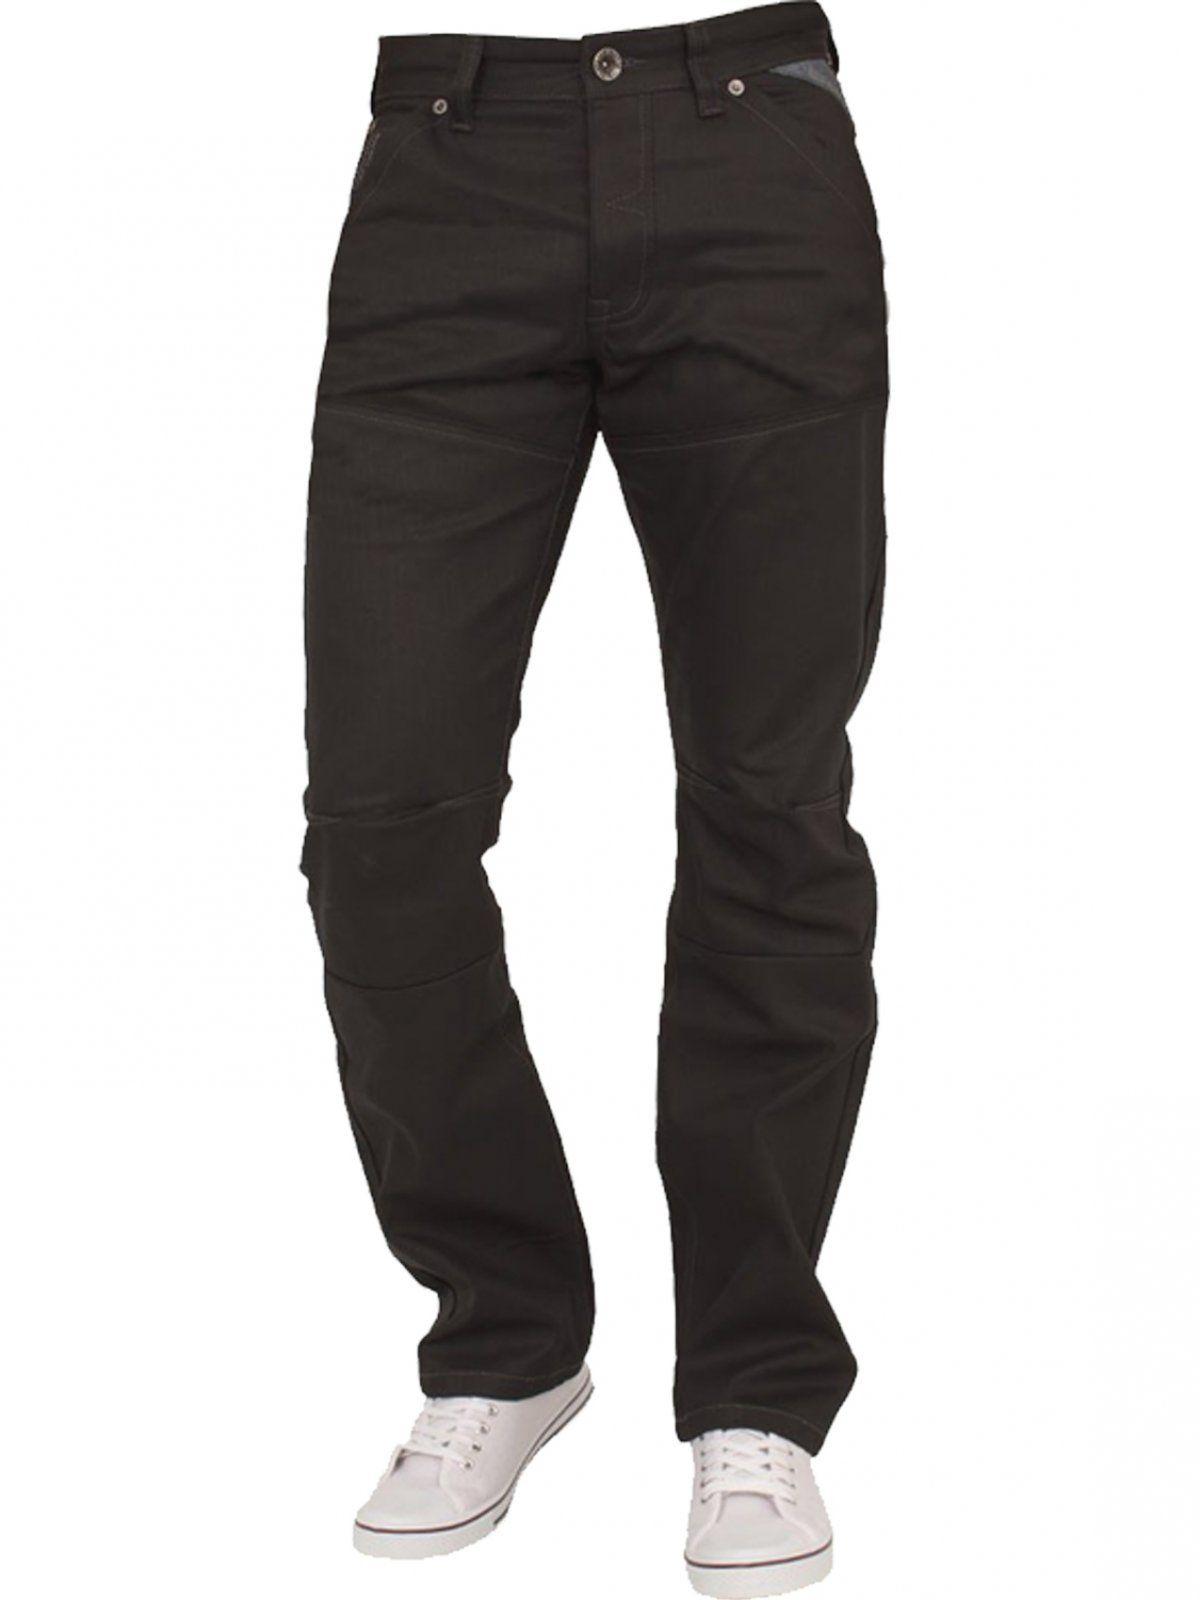 Mens Black Regular Fit Denim Jeans EZ329   Enzo Designer Menswear